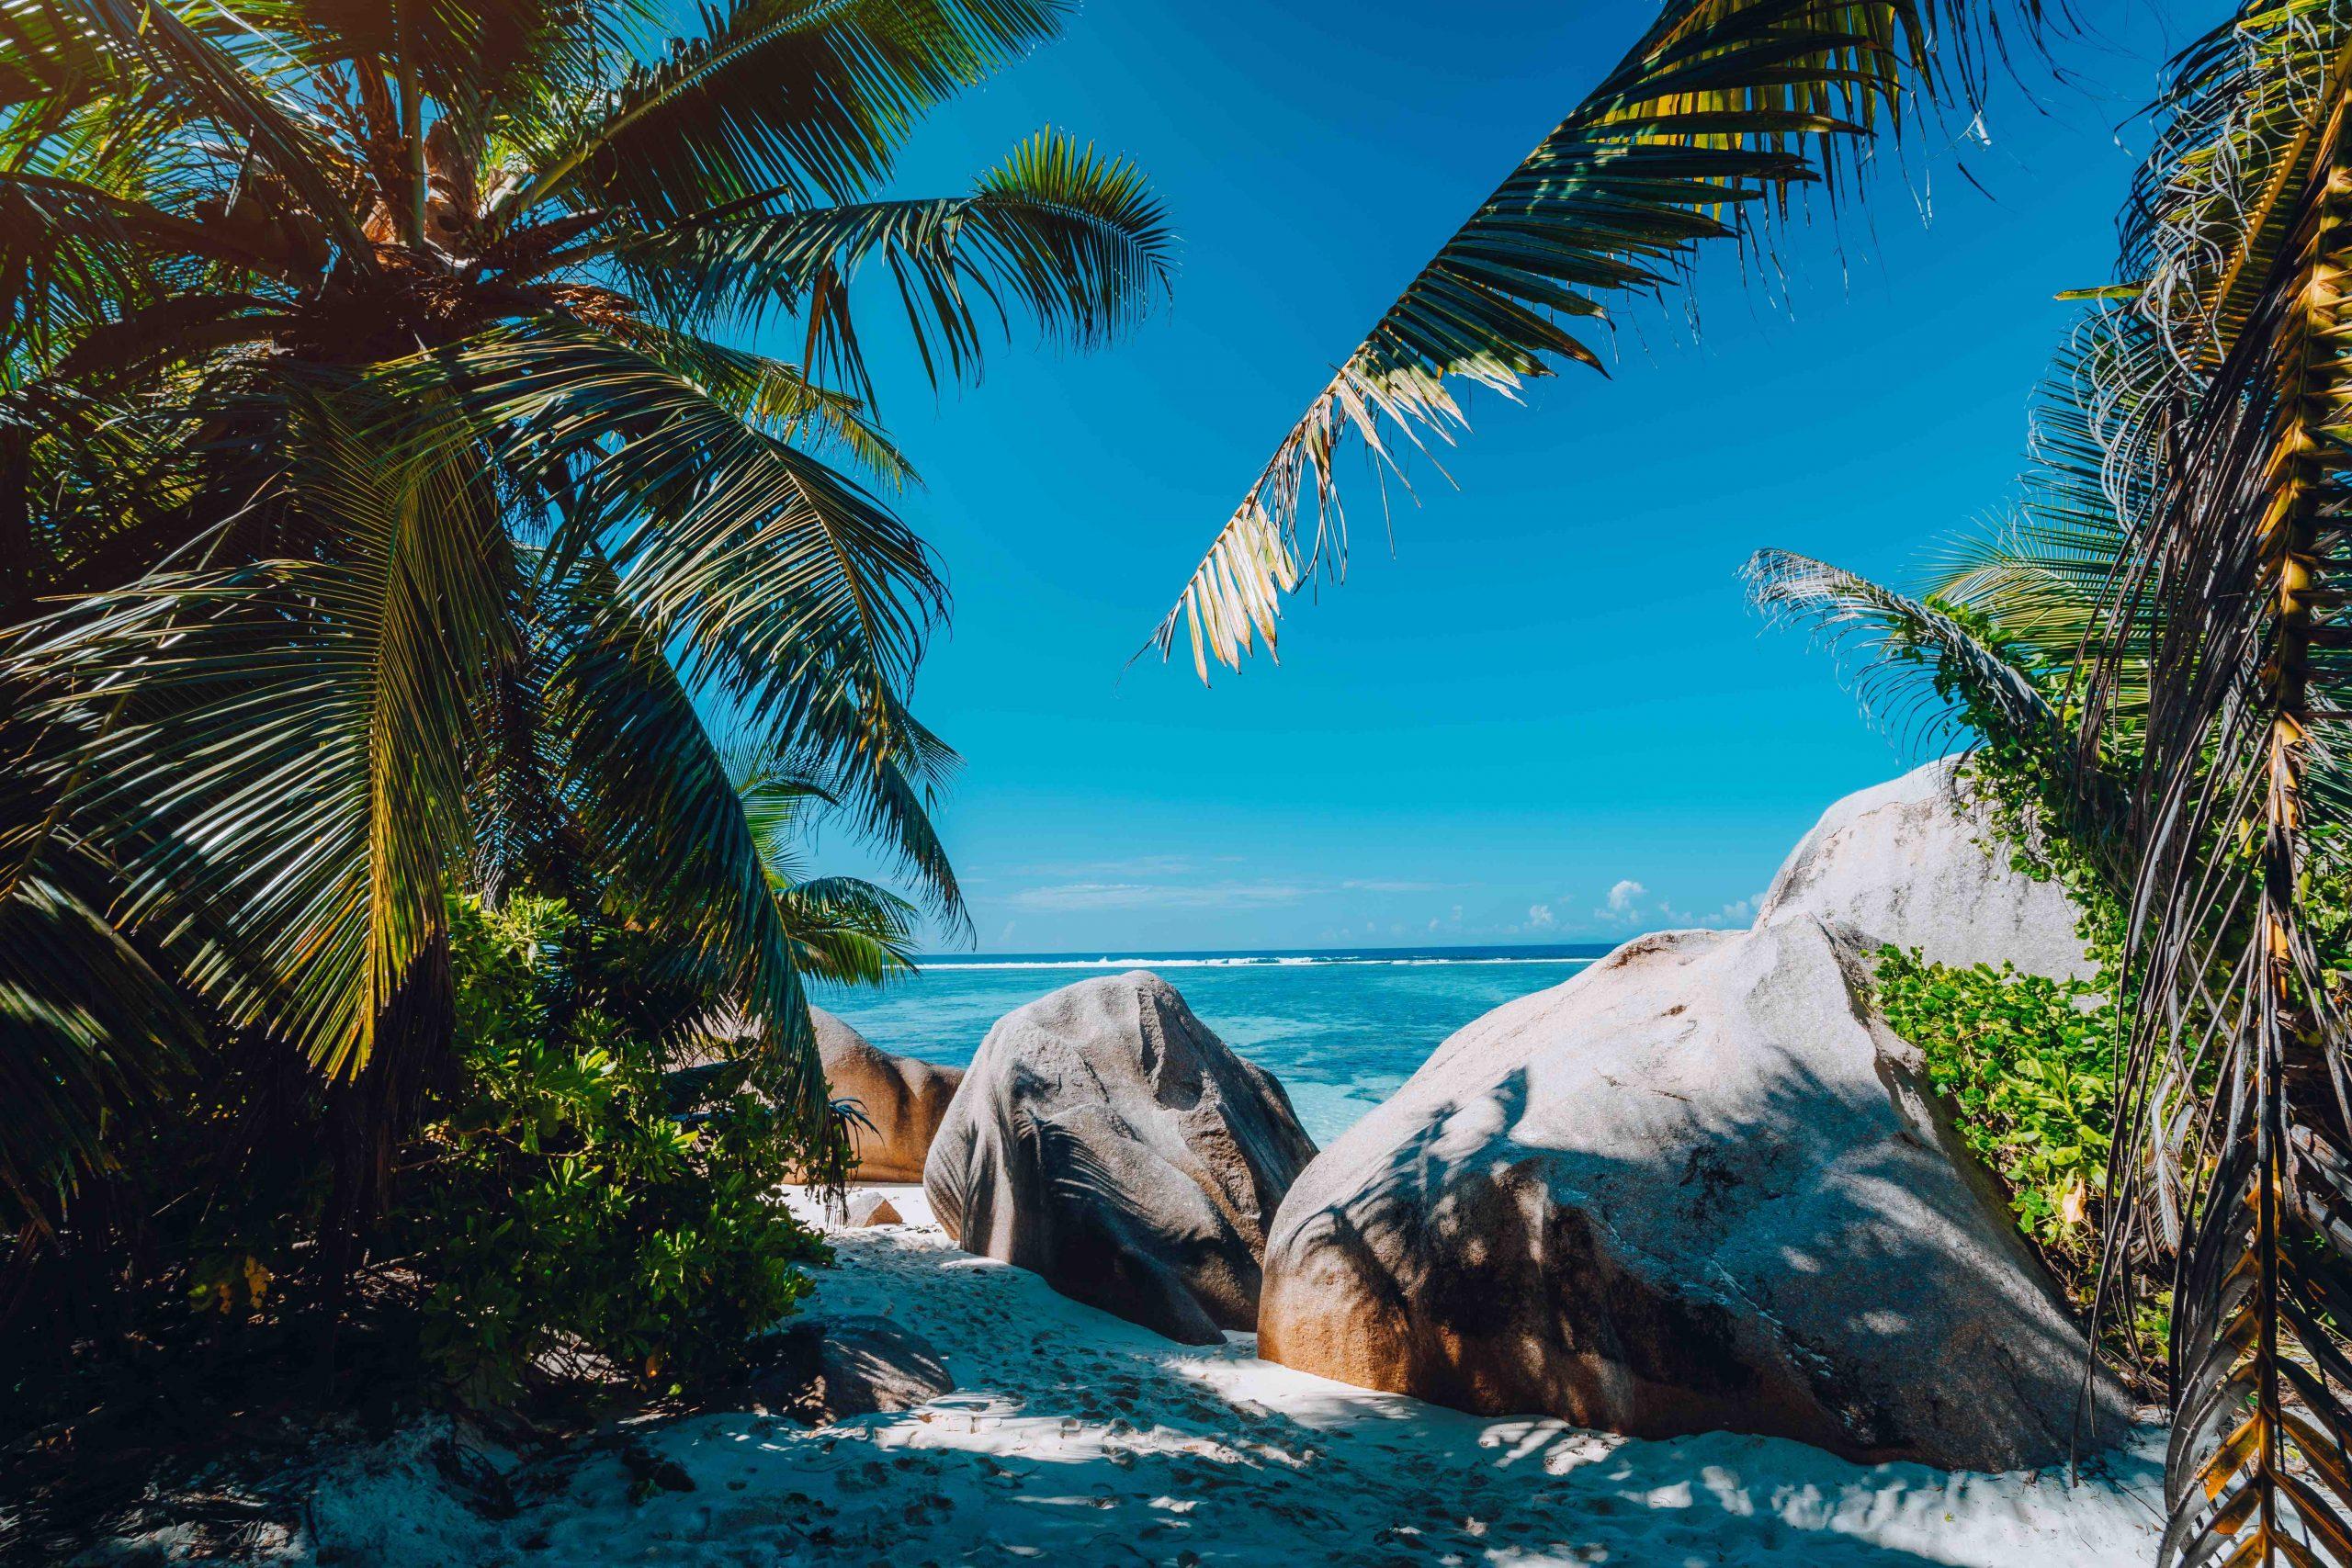 Famous tropical beach Anse Source d'Argent natural palm shade, granite boulders, La Digue Island, Seychelles